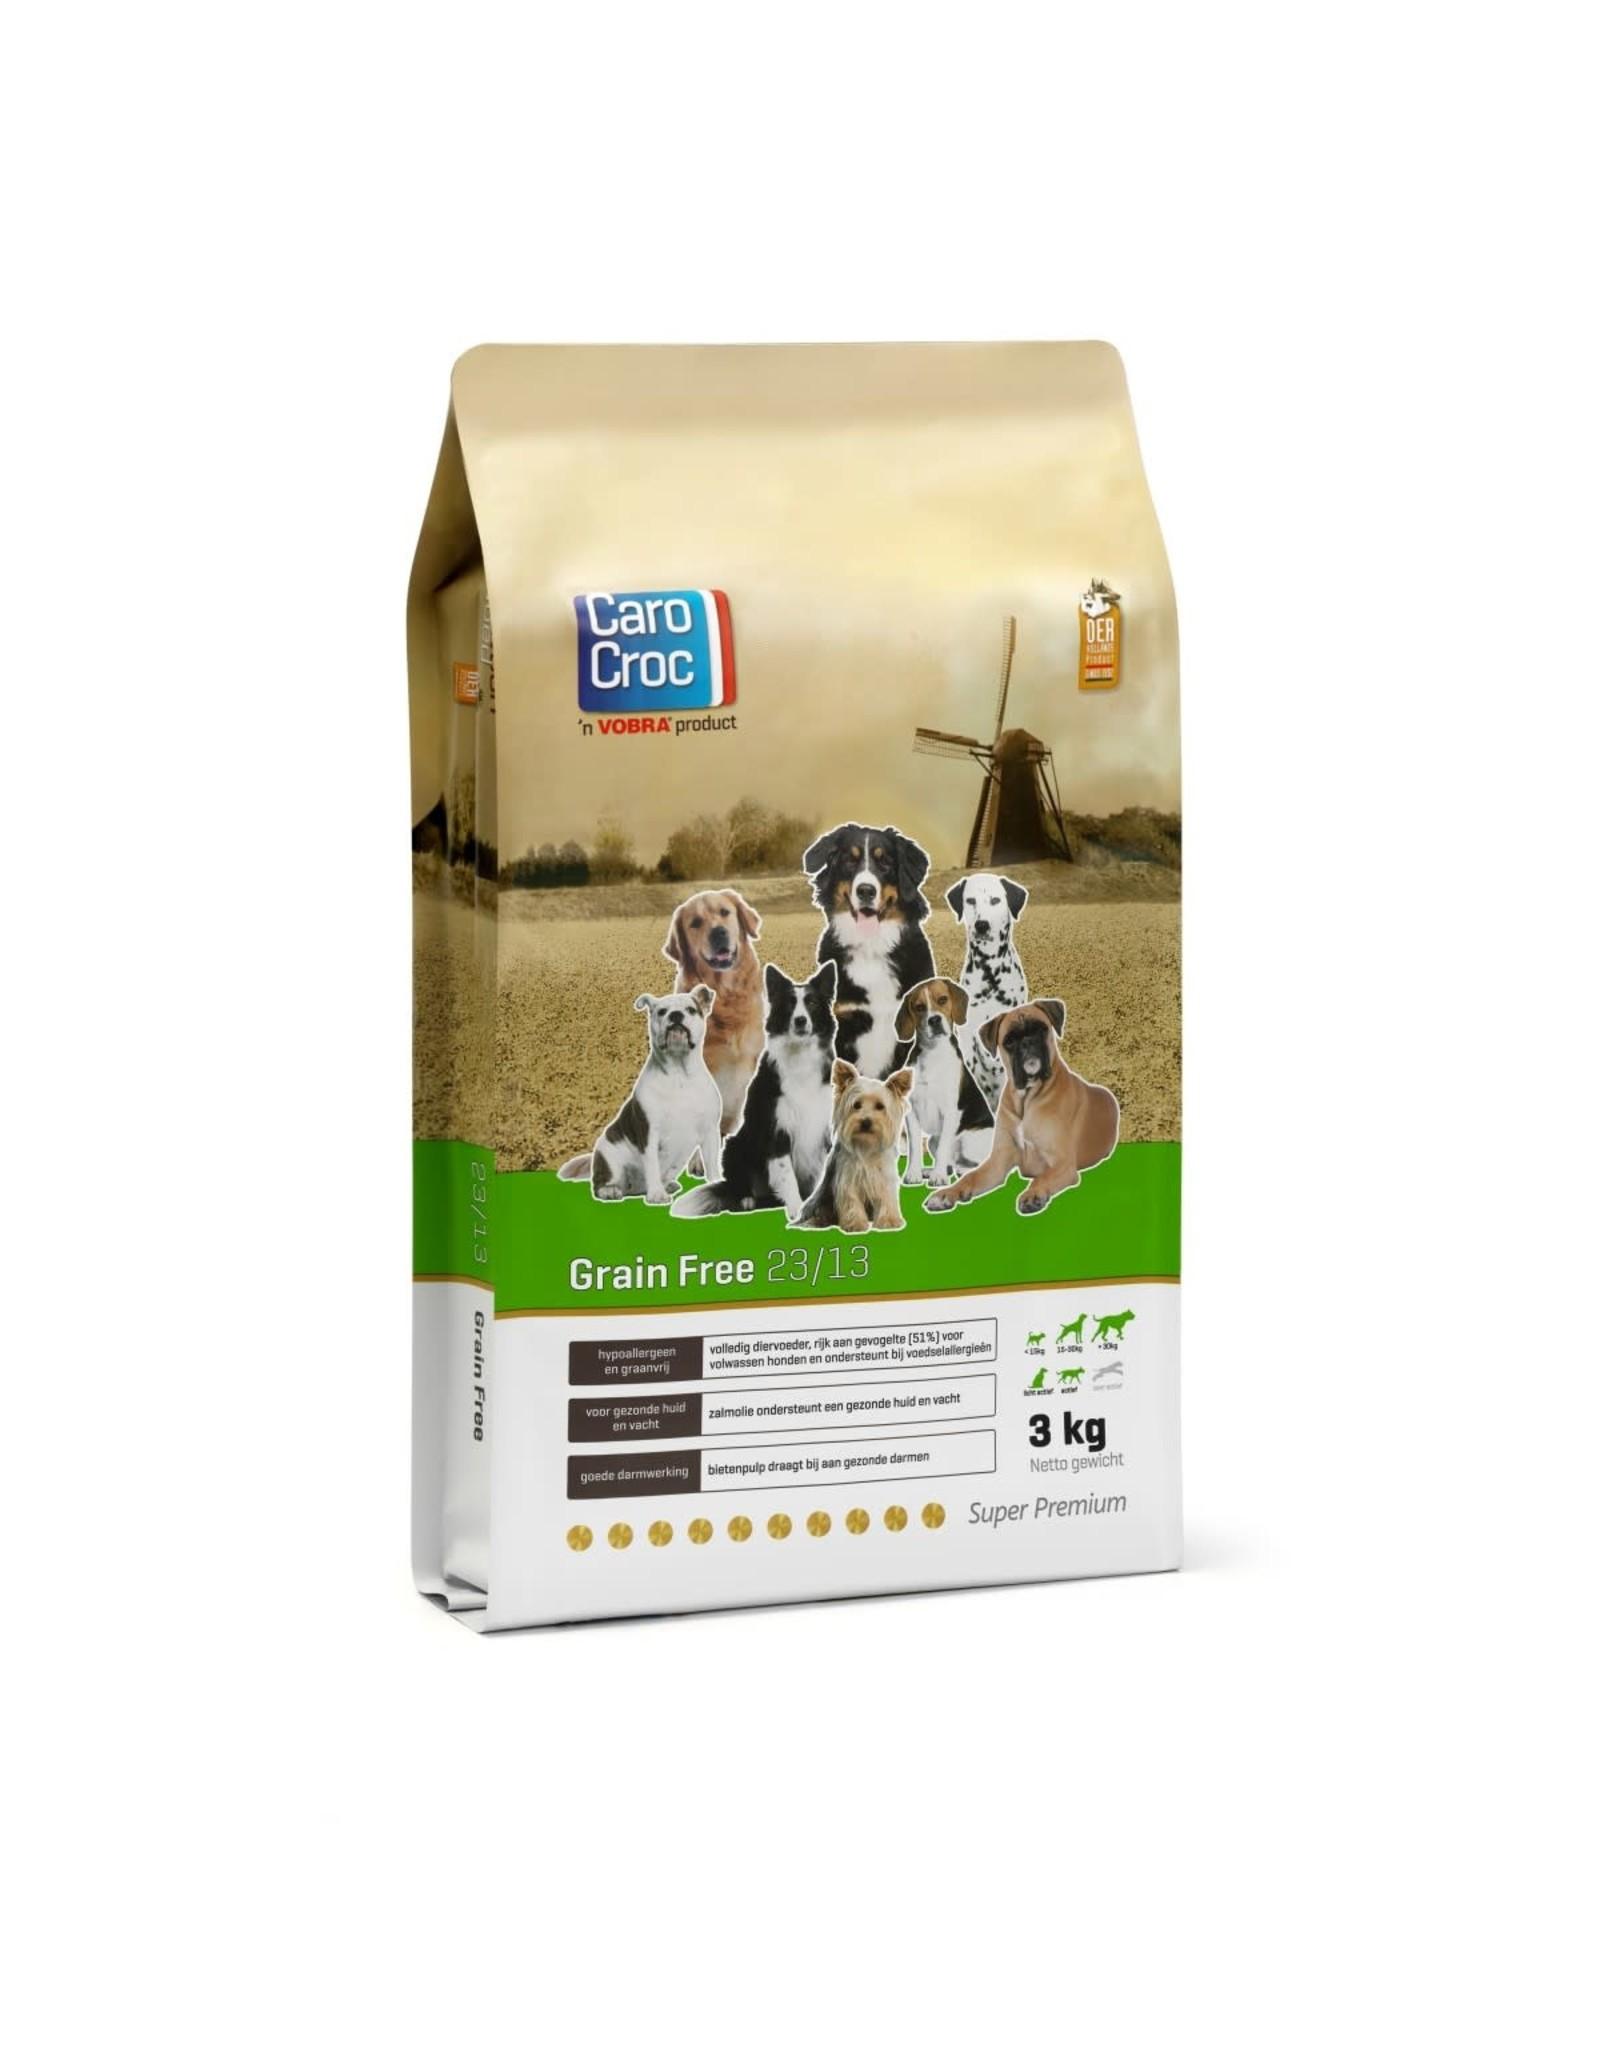 Carocroc Grain Free 3Kg